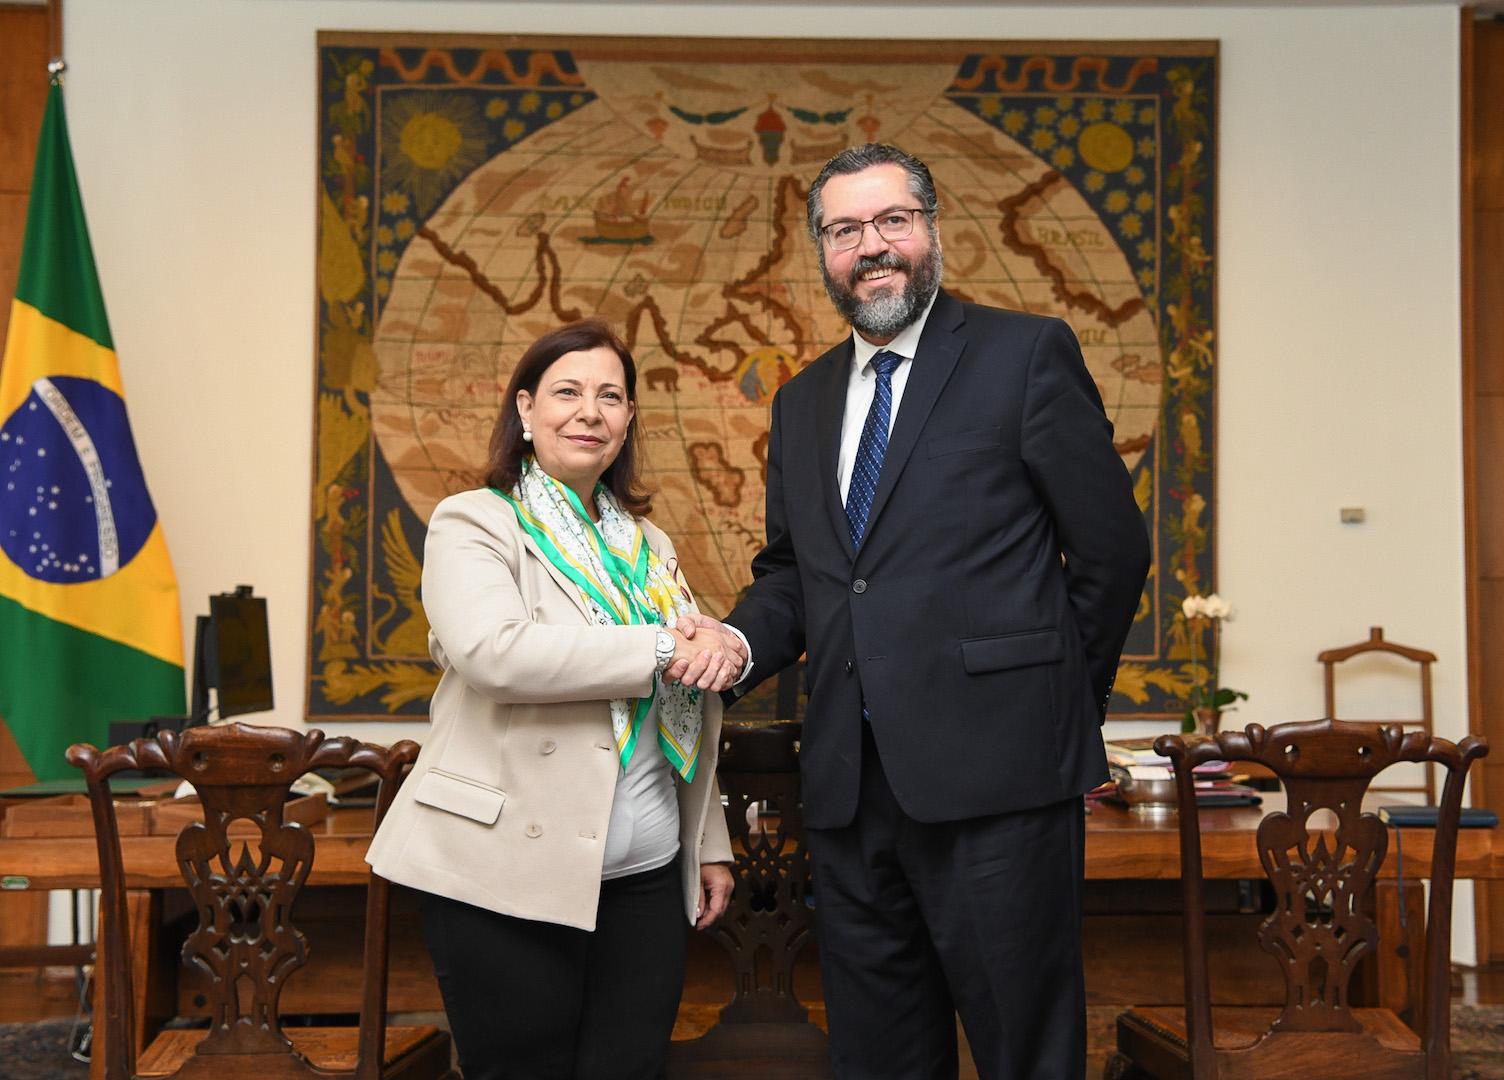 Brazil,Brazil's Foreign Minister, Ernesto Araújo, met with Venezuelan ambassador to Brazil, Maria Teresa Belandria, on Monday.